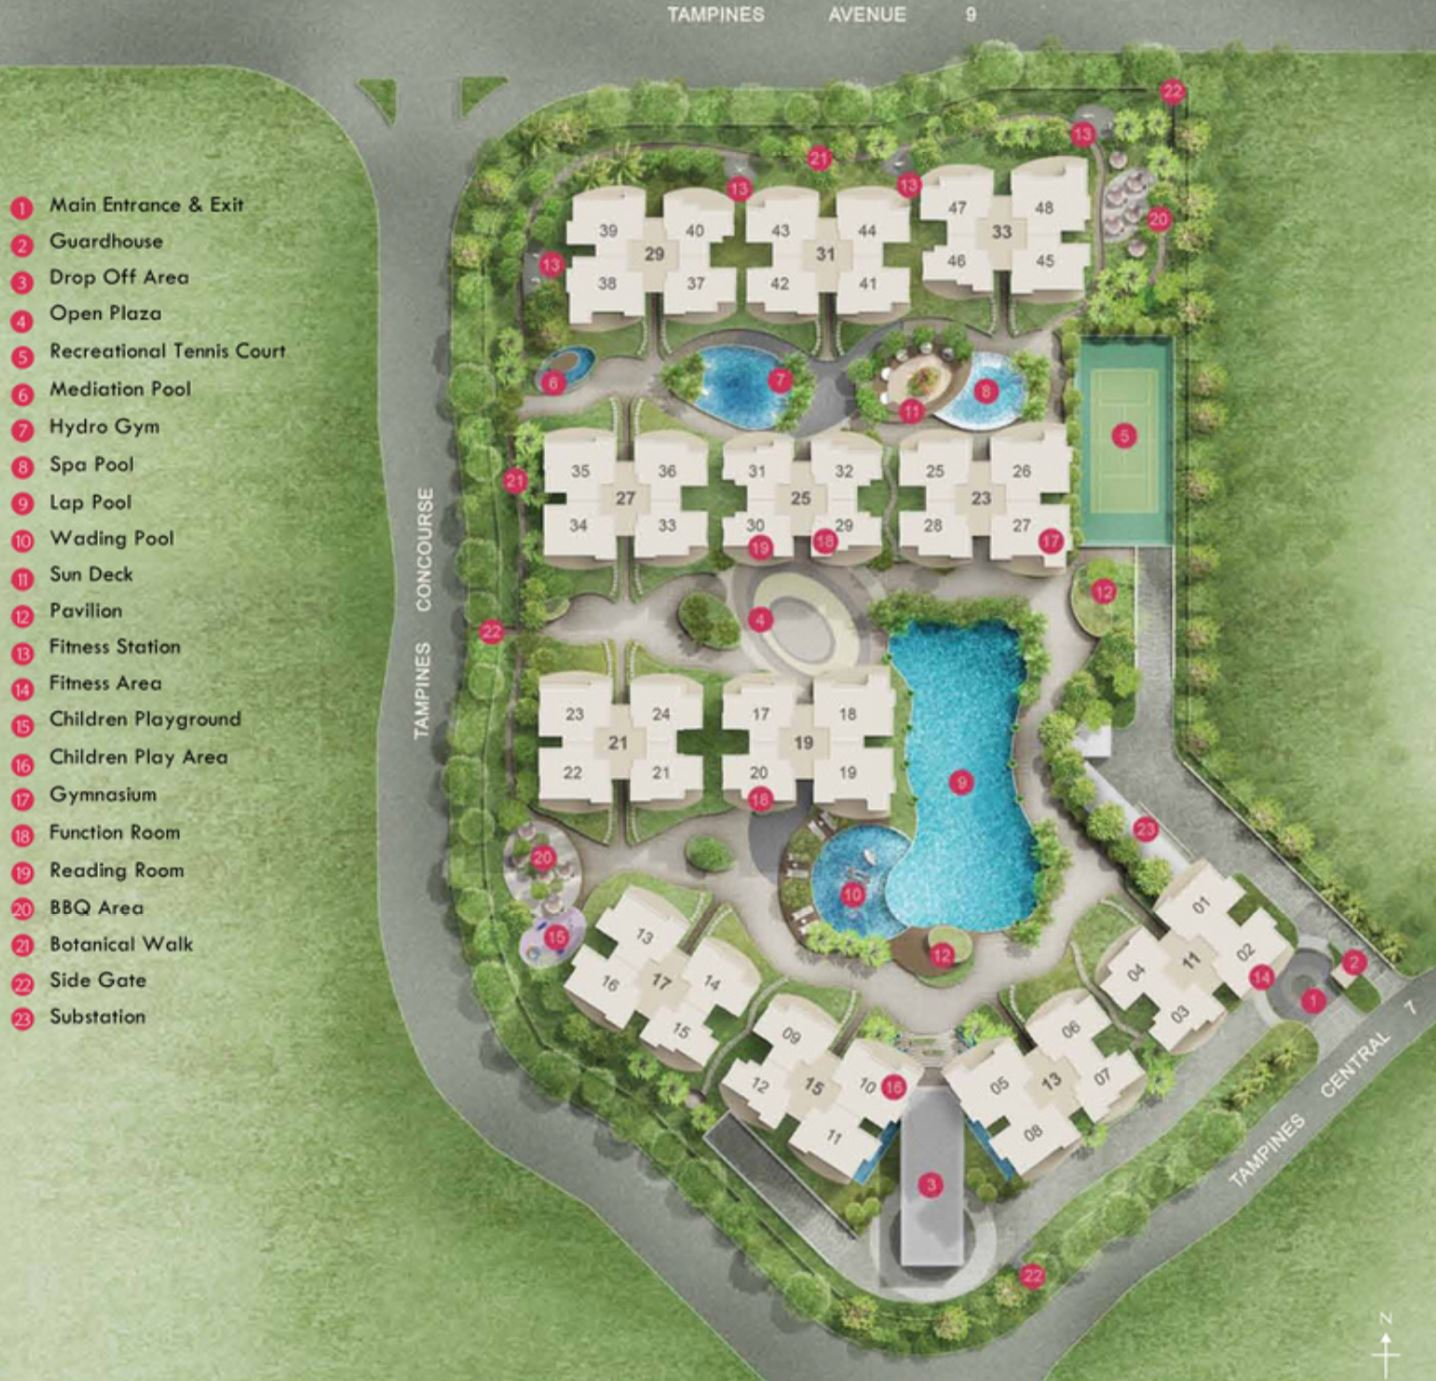 The Tampines Trilliant Site Plan & Facilities